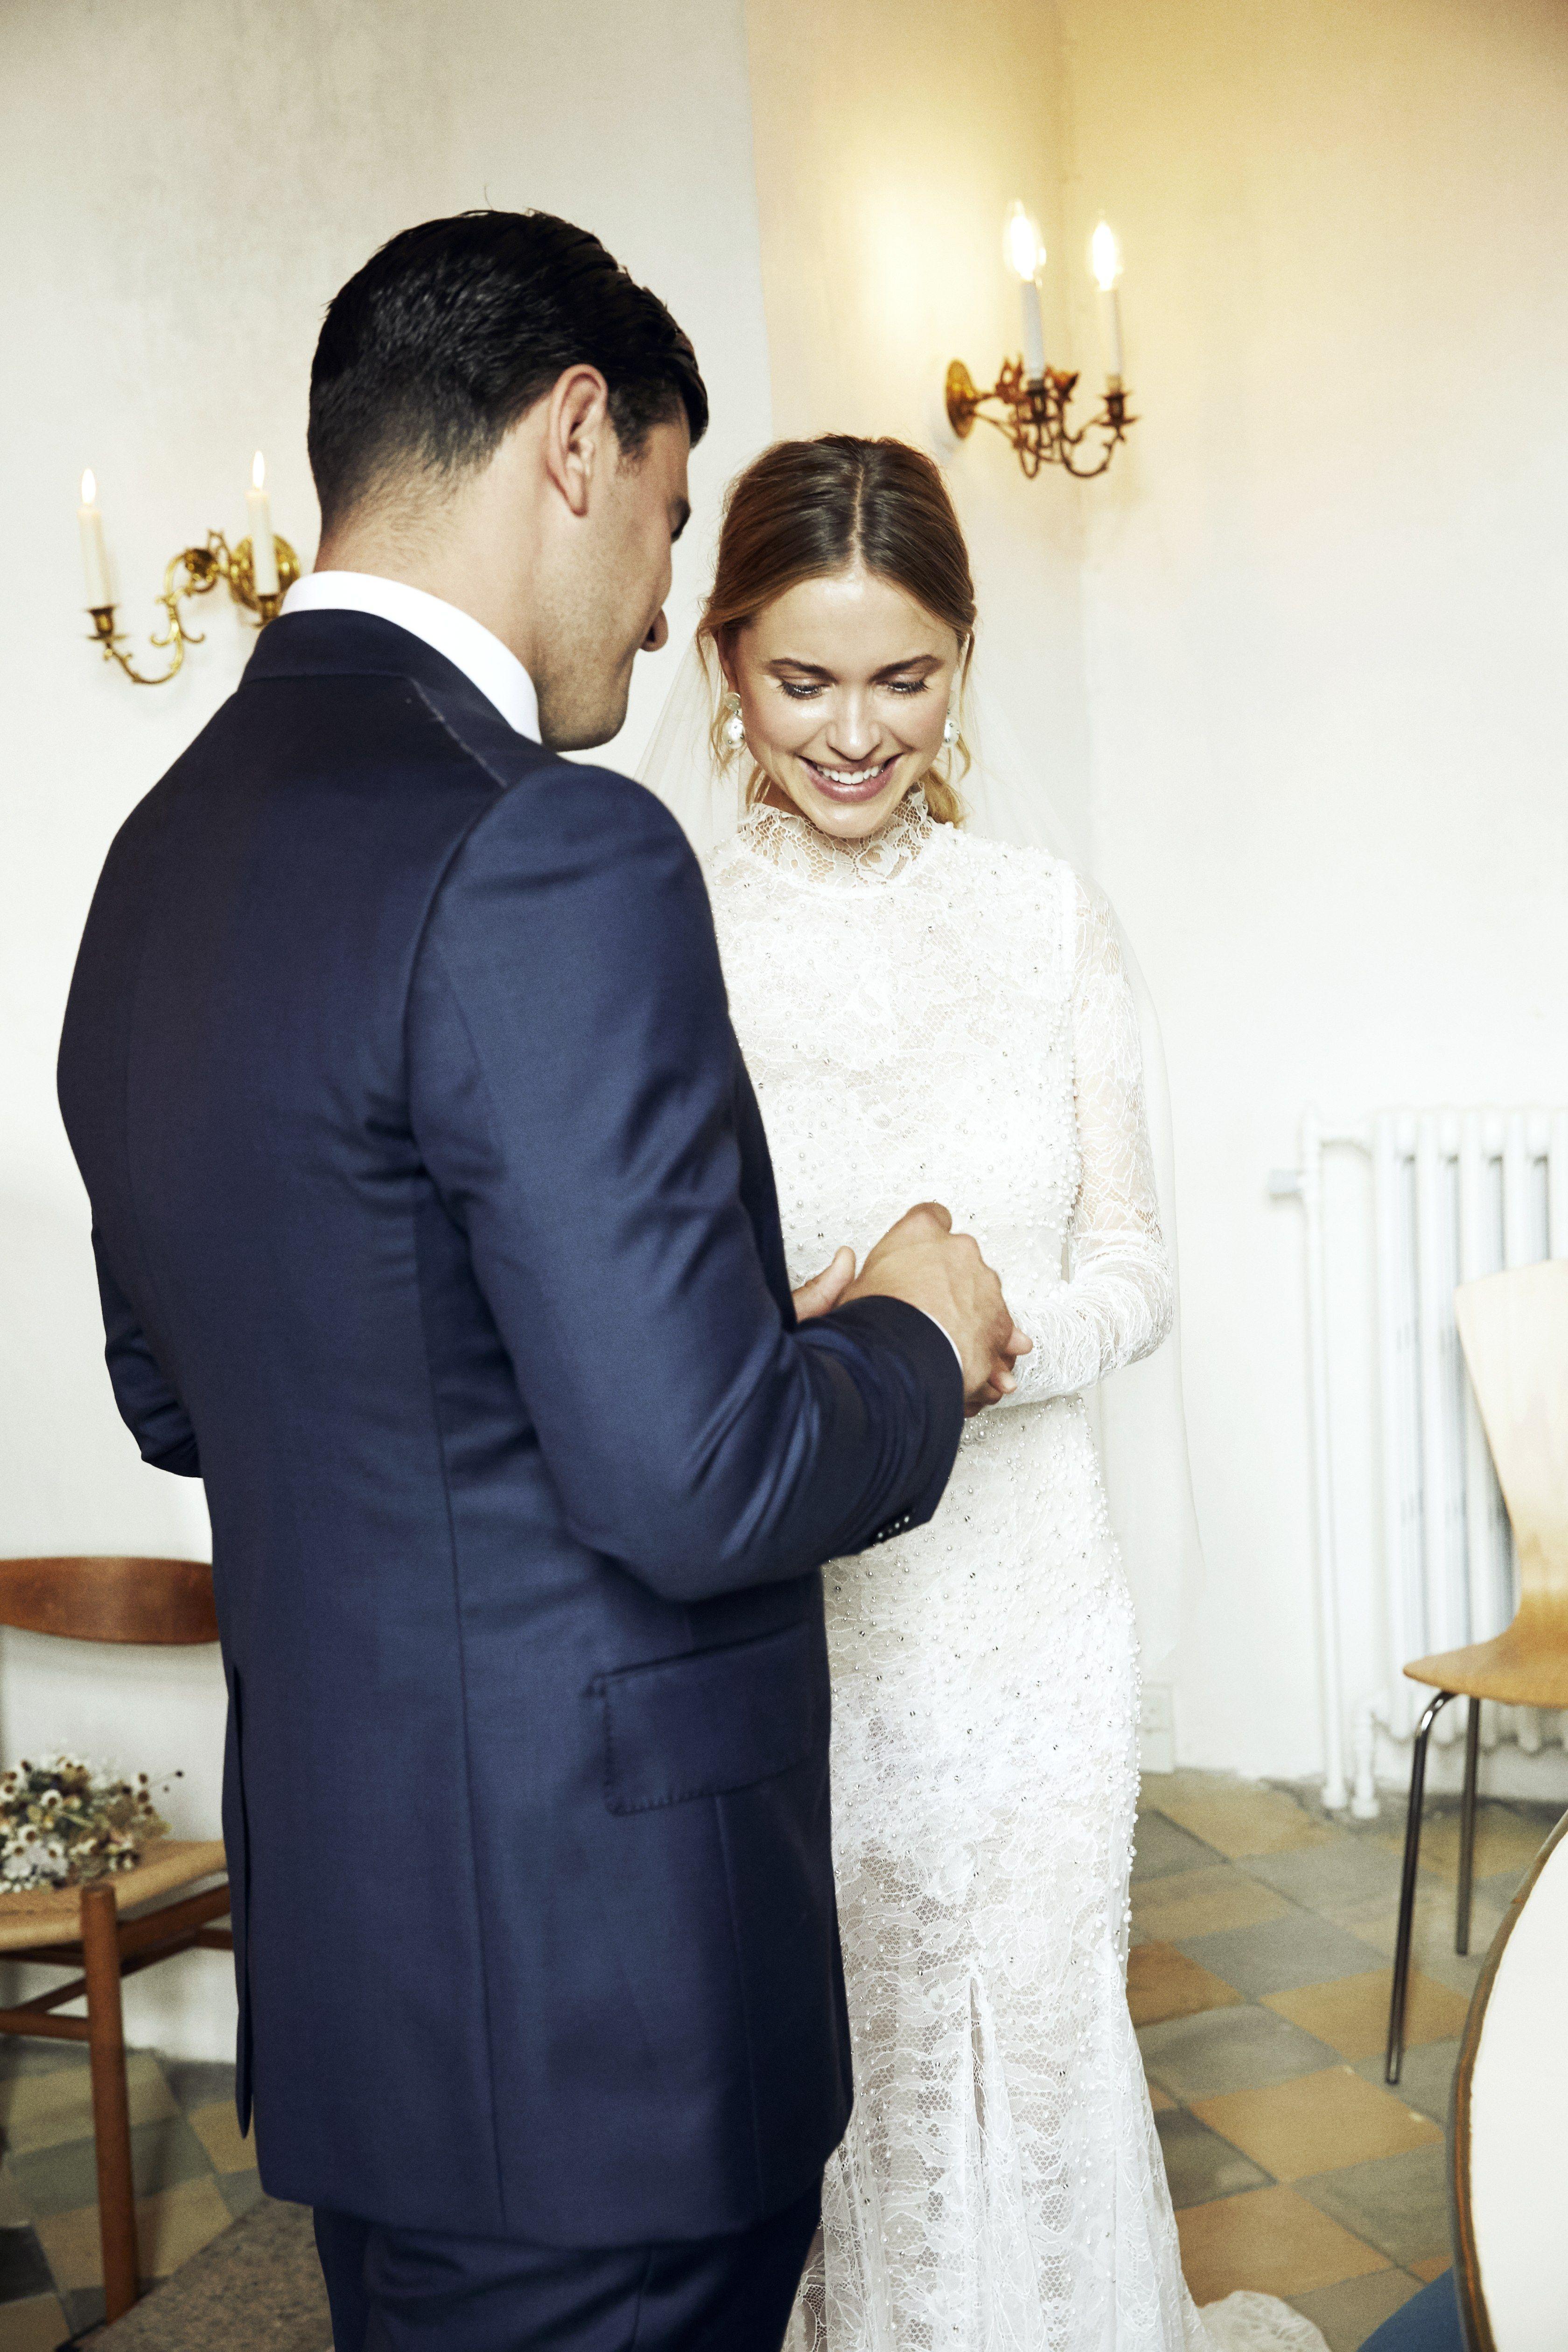 Pernille Teisbaek's Stylish Wedding Off the Coast of